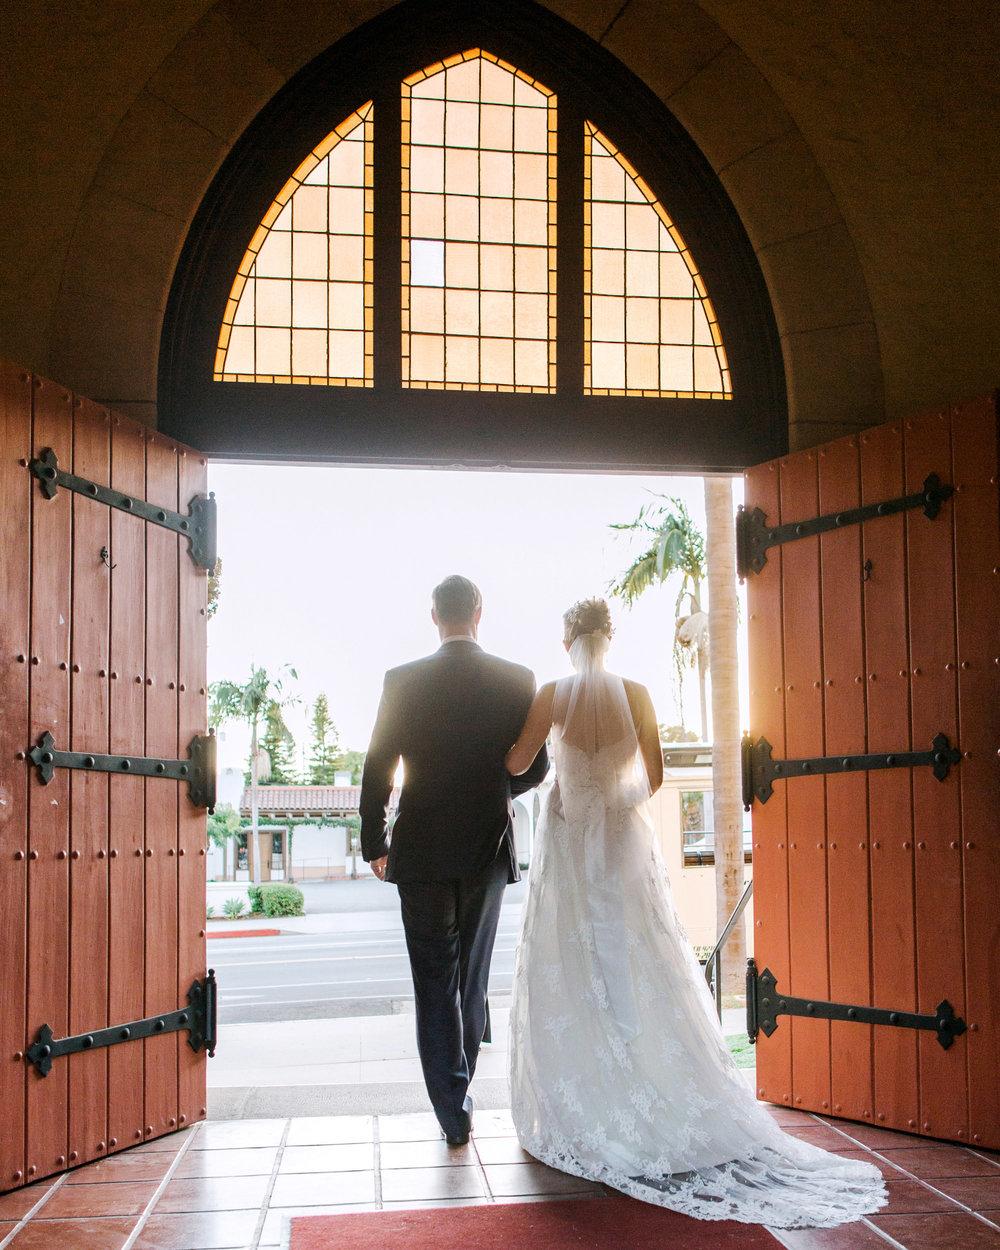 biltmore_santa_barbara_wedding_photos_coral_casino_028.jpg